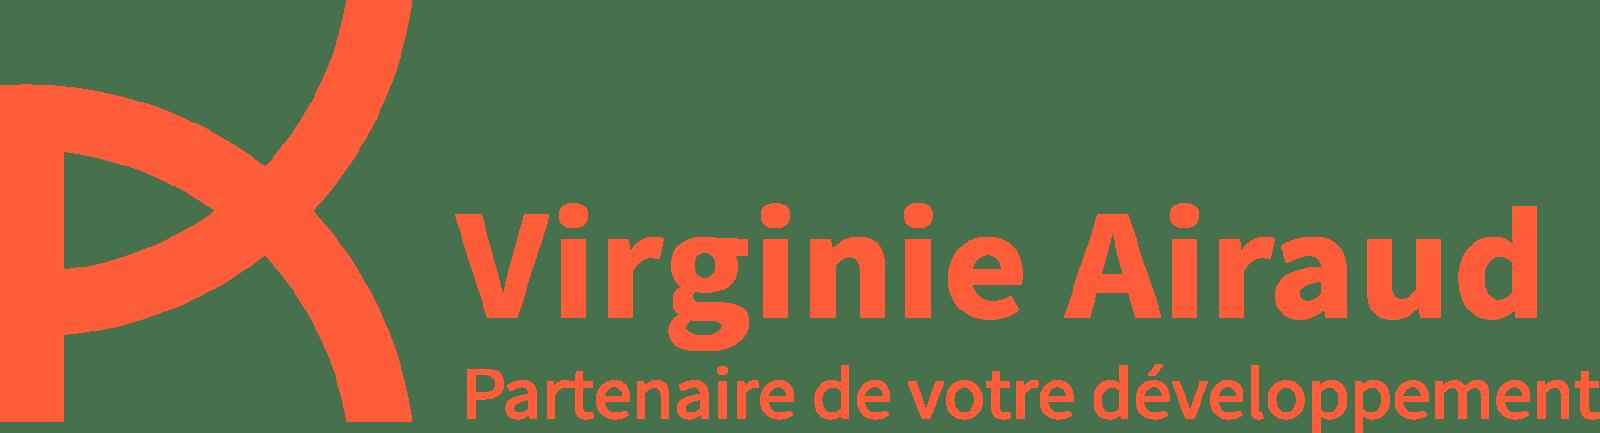 Virginie Airaud